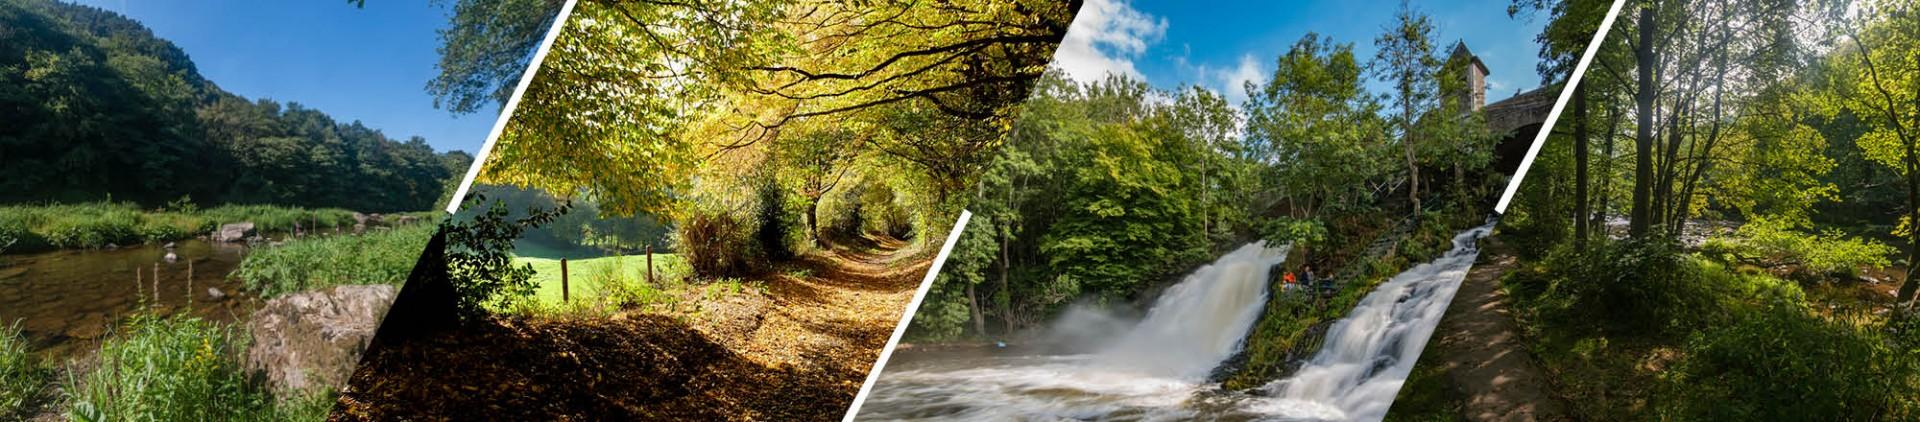 Sites naturels en province de Liège